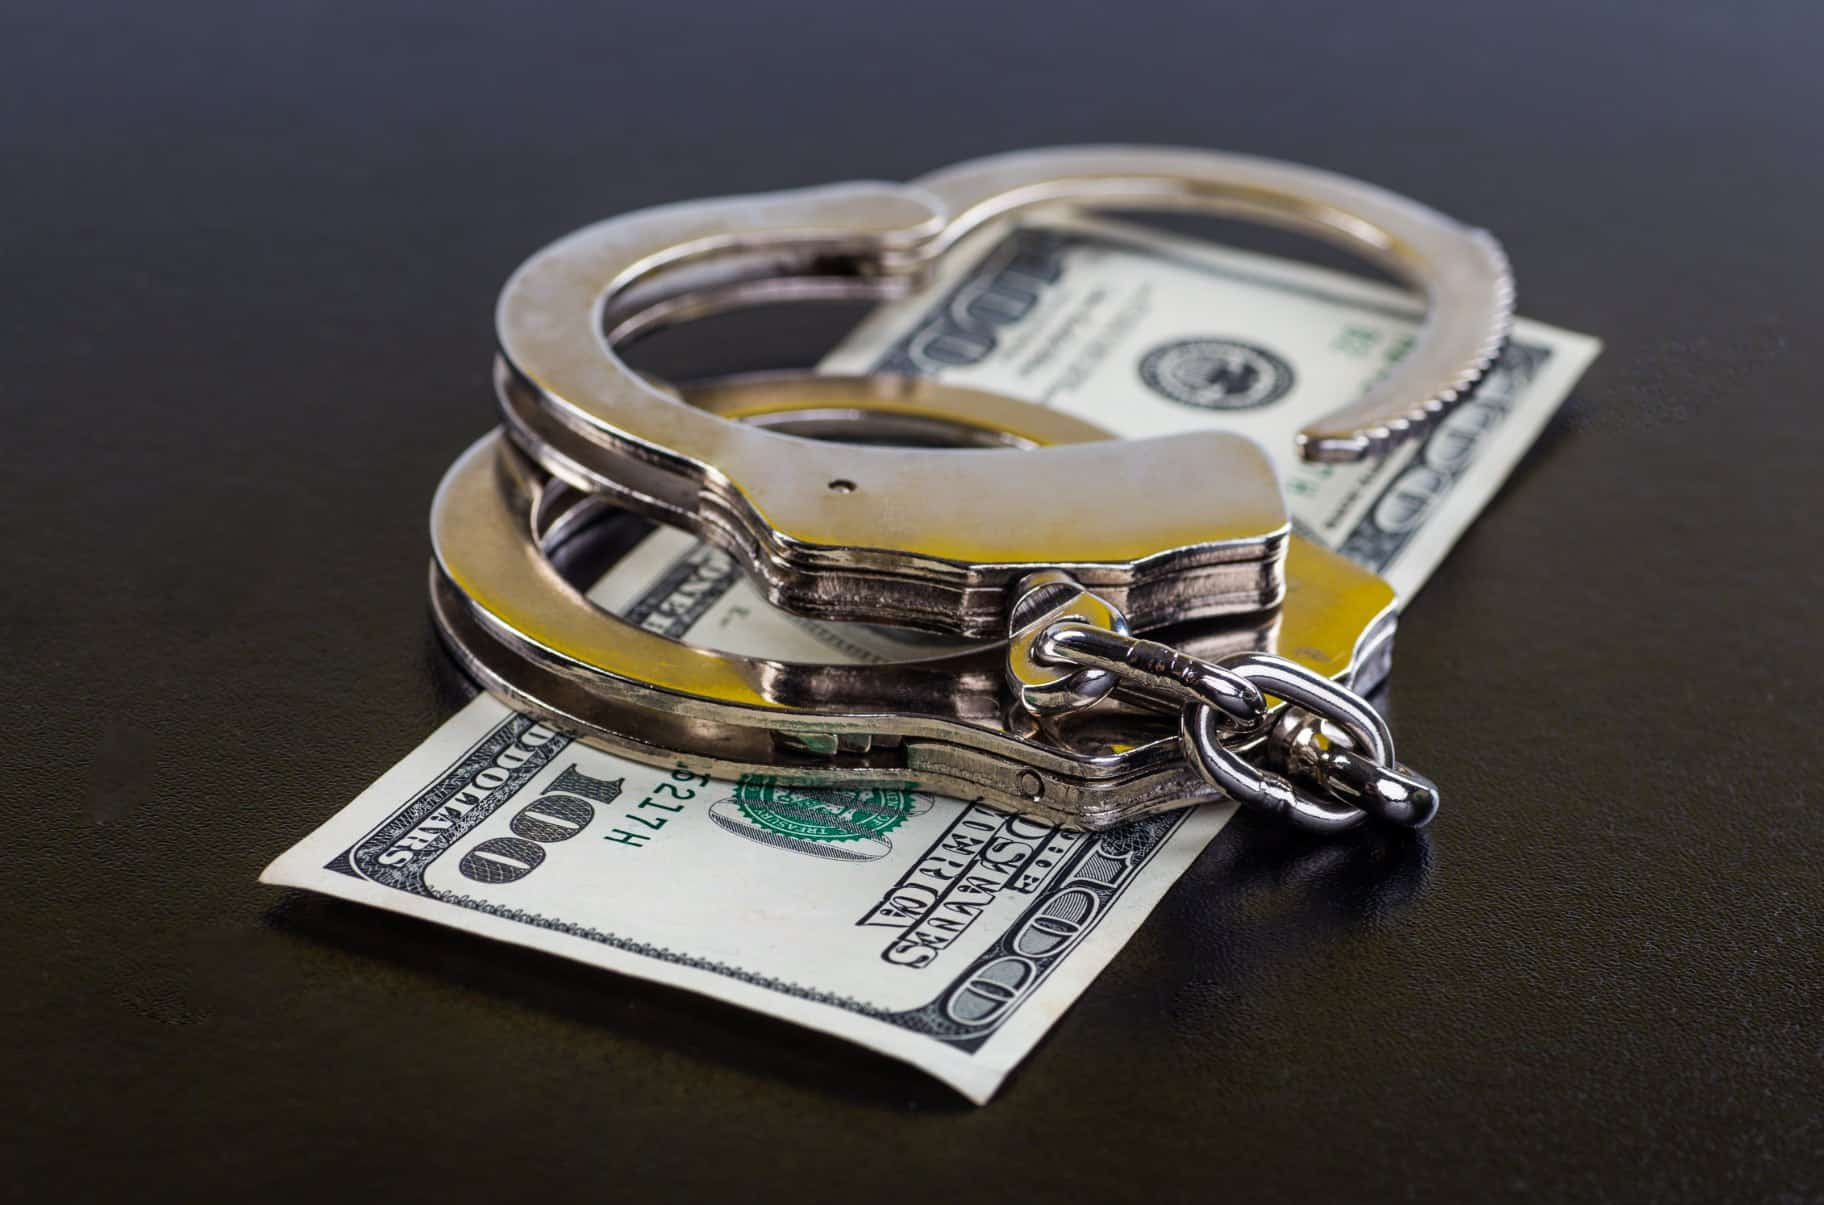 FATCA & Possible Criminal Charges